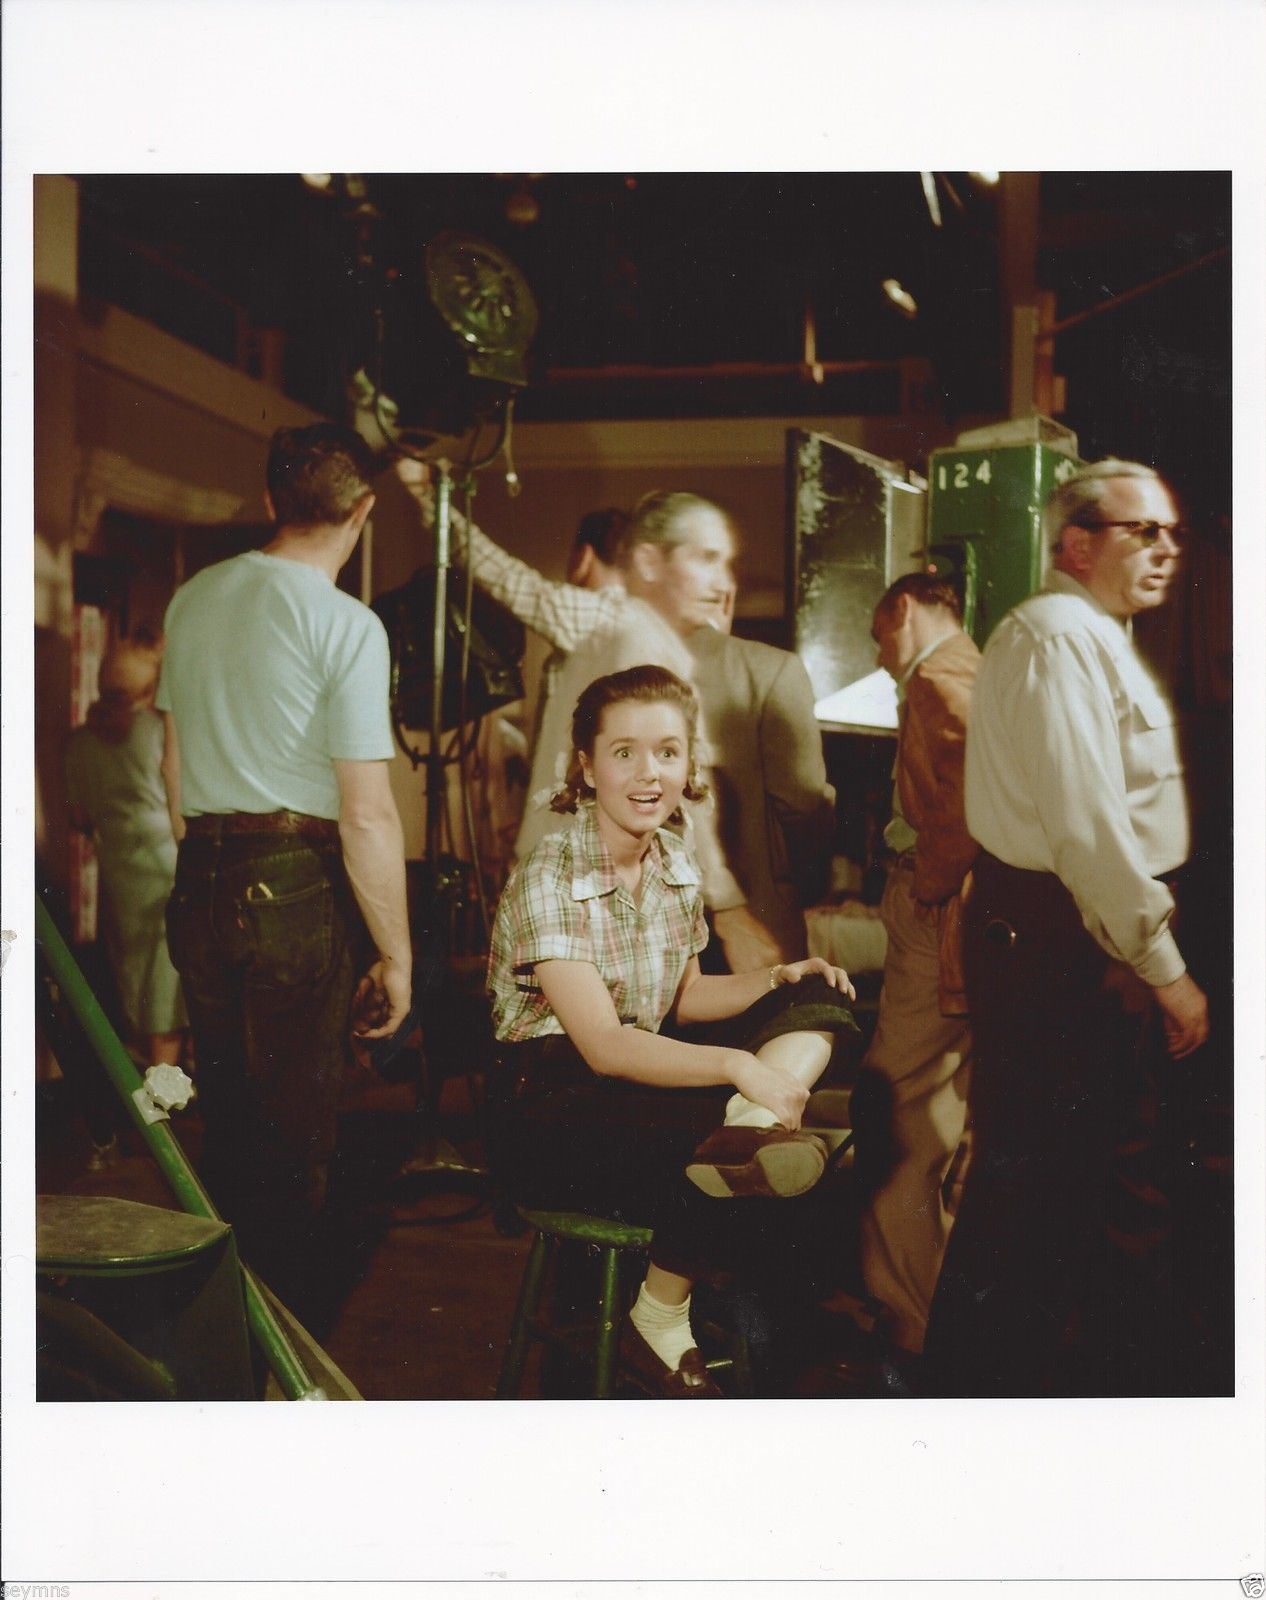 Will Scarlett Johansson Walk The Carpet At The Oscars One News Page moreover Id123 as well 1980 moreover Bryce Dallas Howard besides 1980. on oscar nomination nastassja kinski